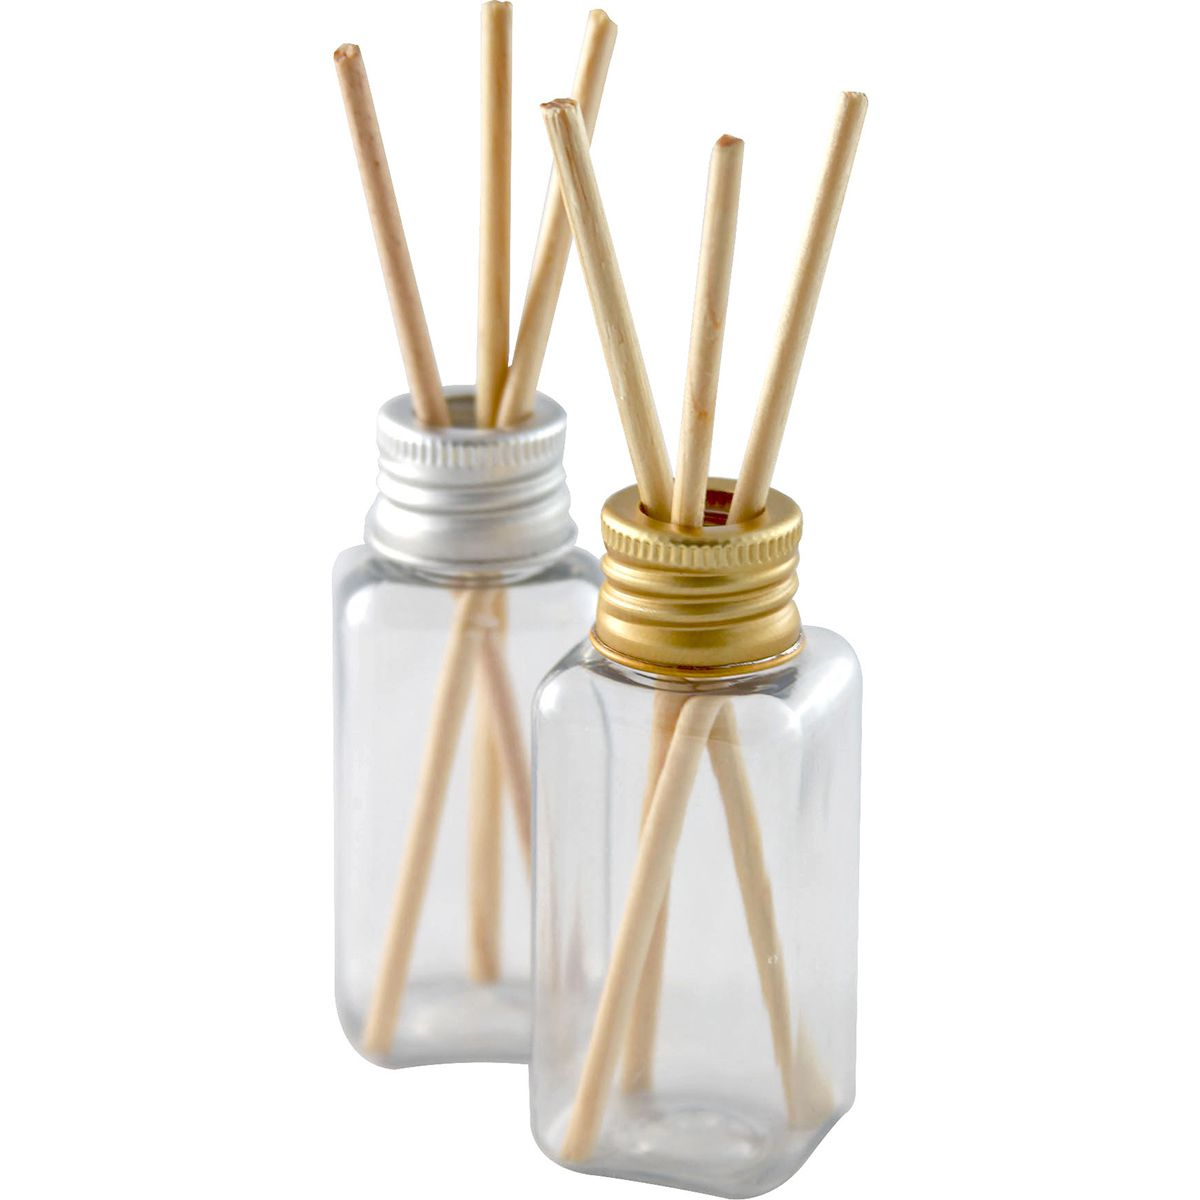 Frasco para Aromatizador Atacado Plástico de 40 ml kit com 70 unidades